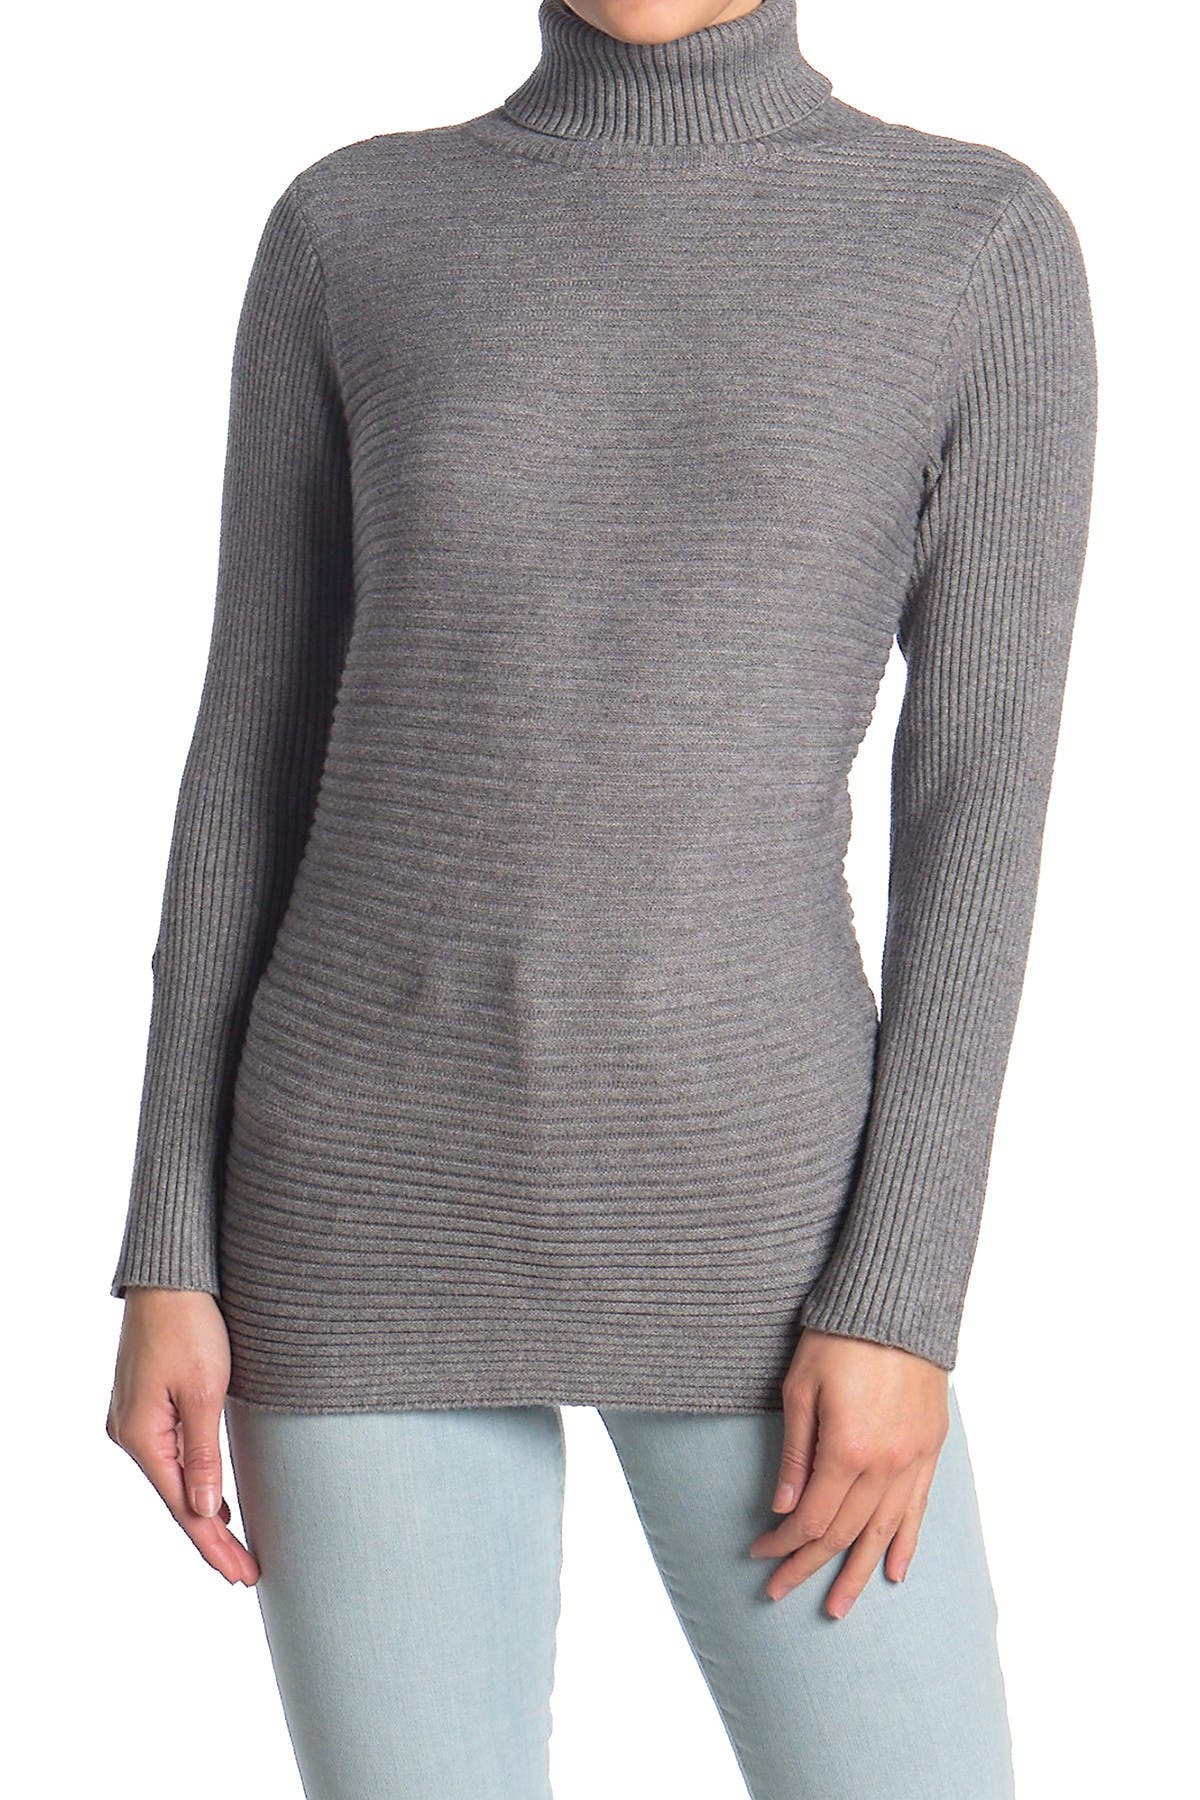 Image of Cyrus Ottoman Turtleneck Sweater